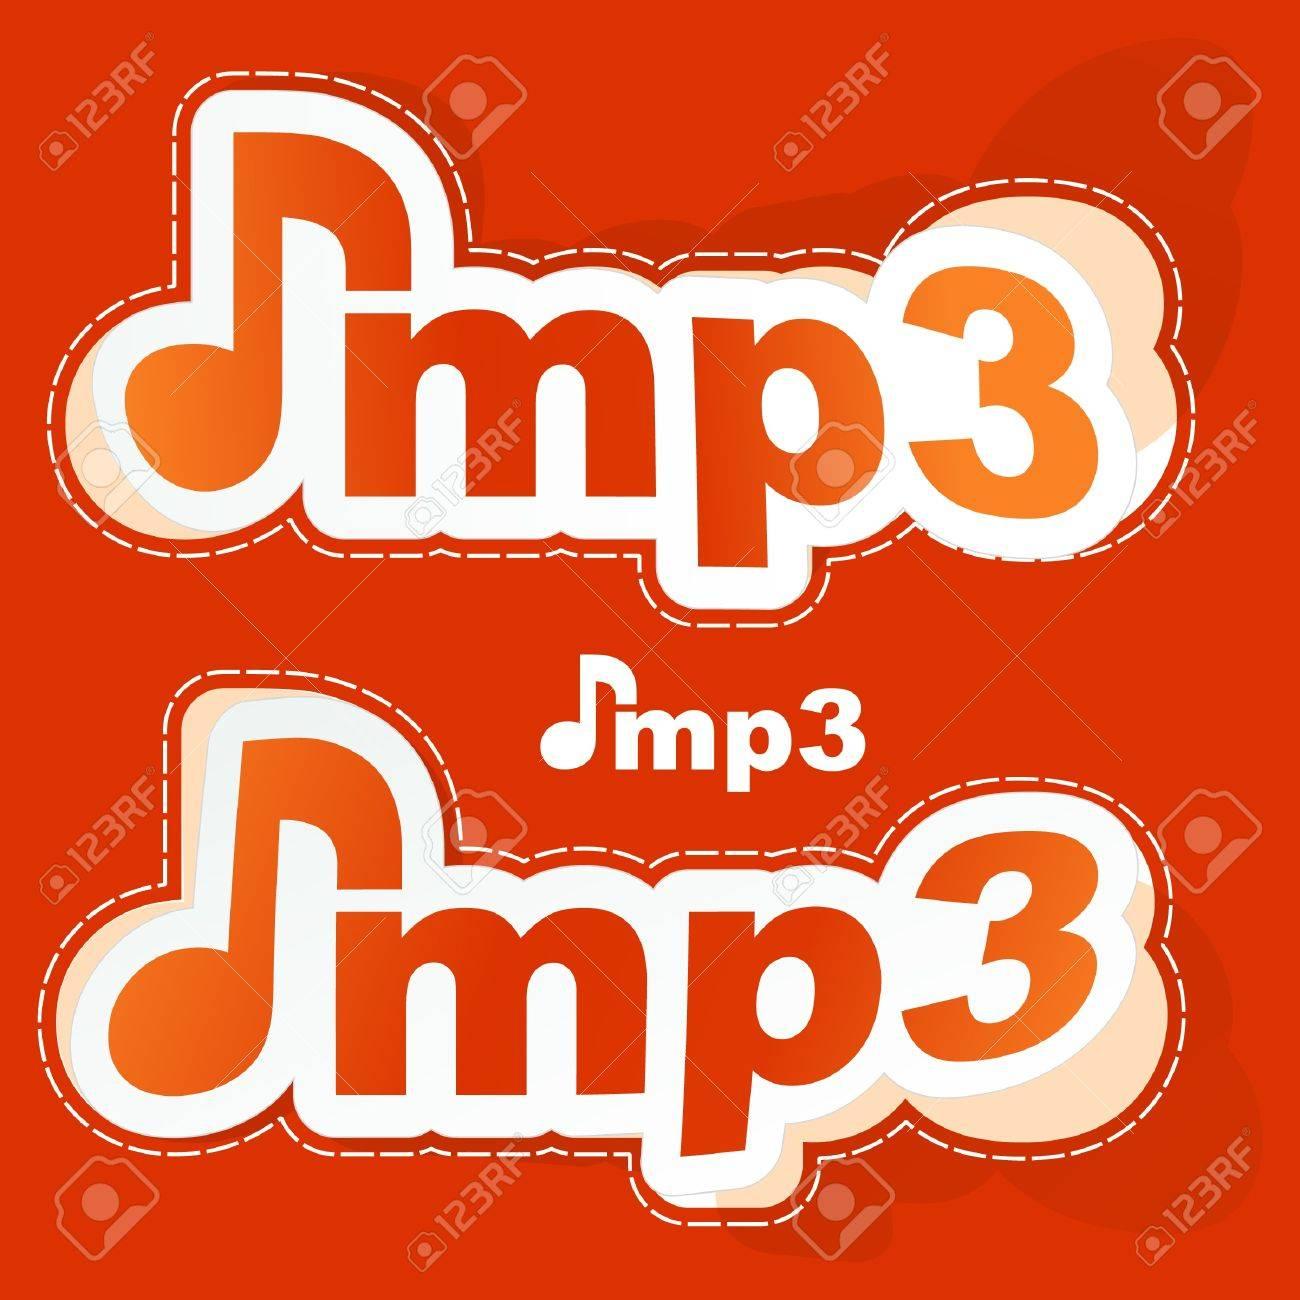 MP3. Sticker set. Stock Vector - 9397544